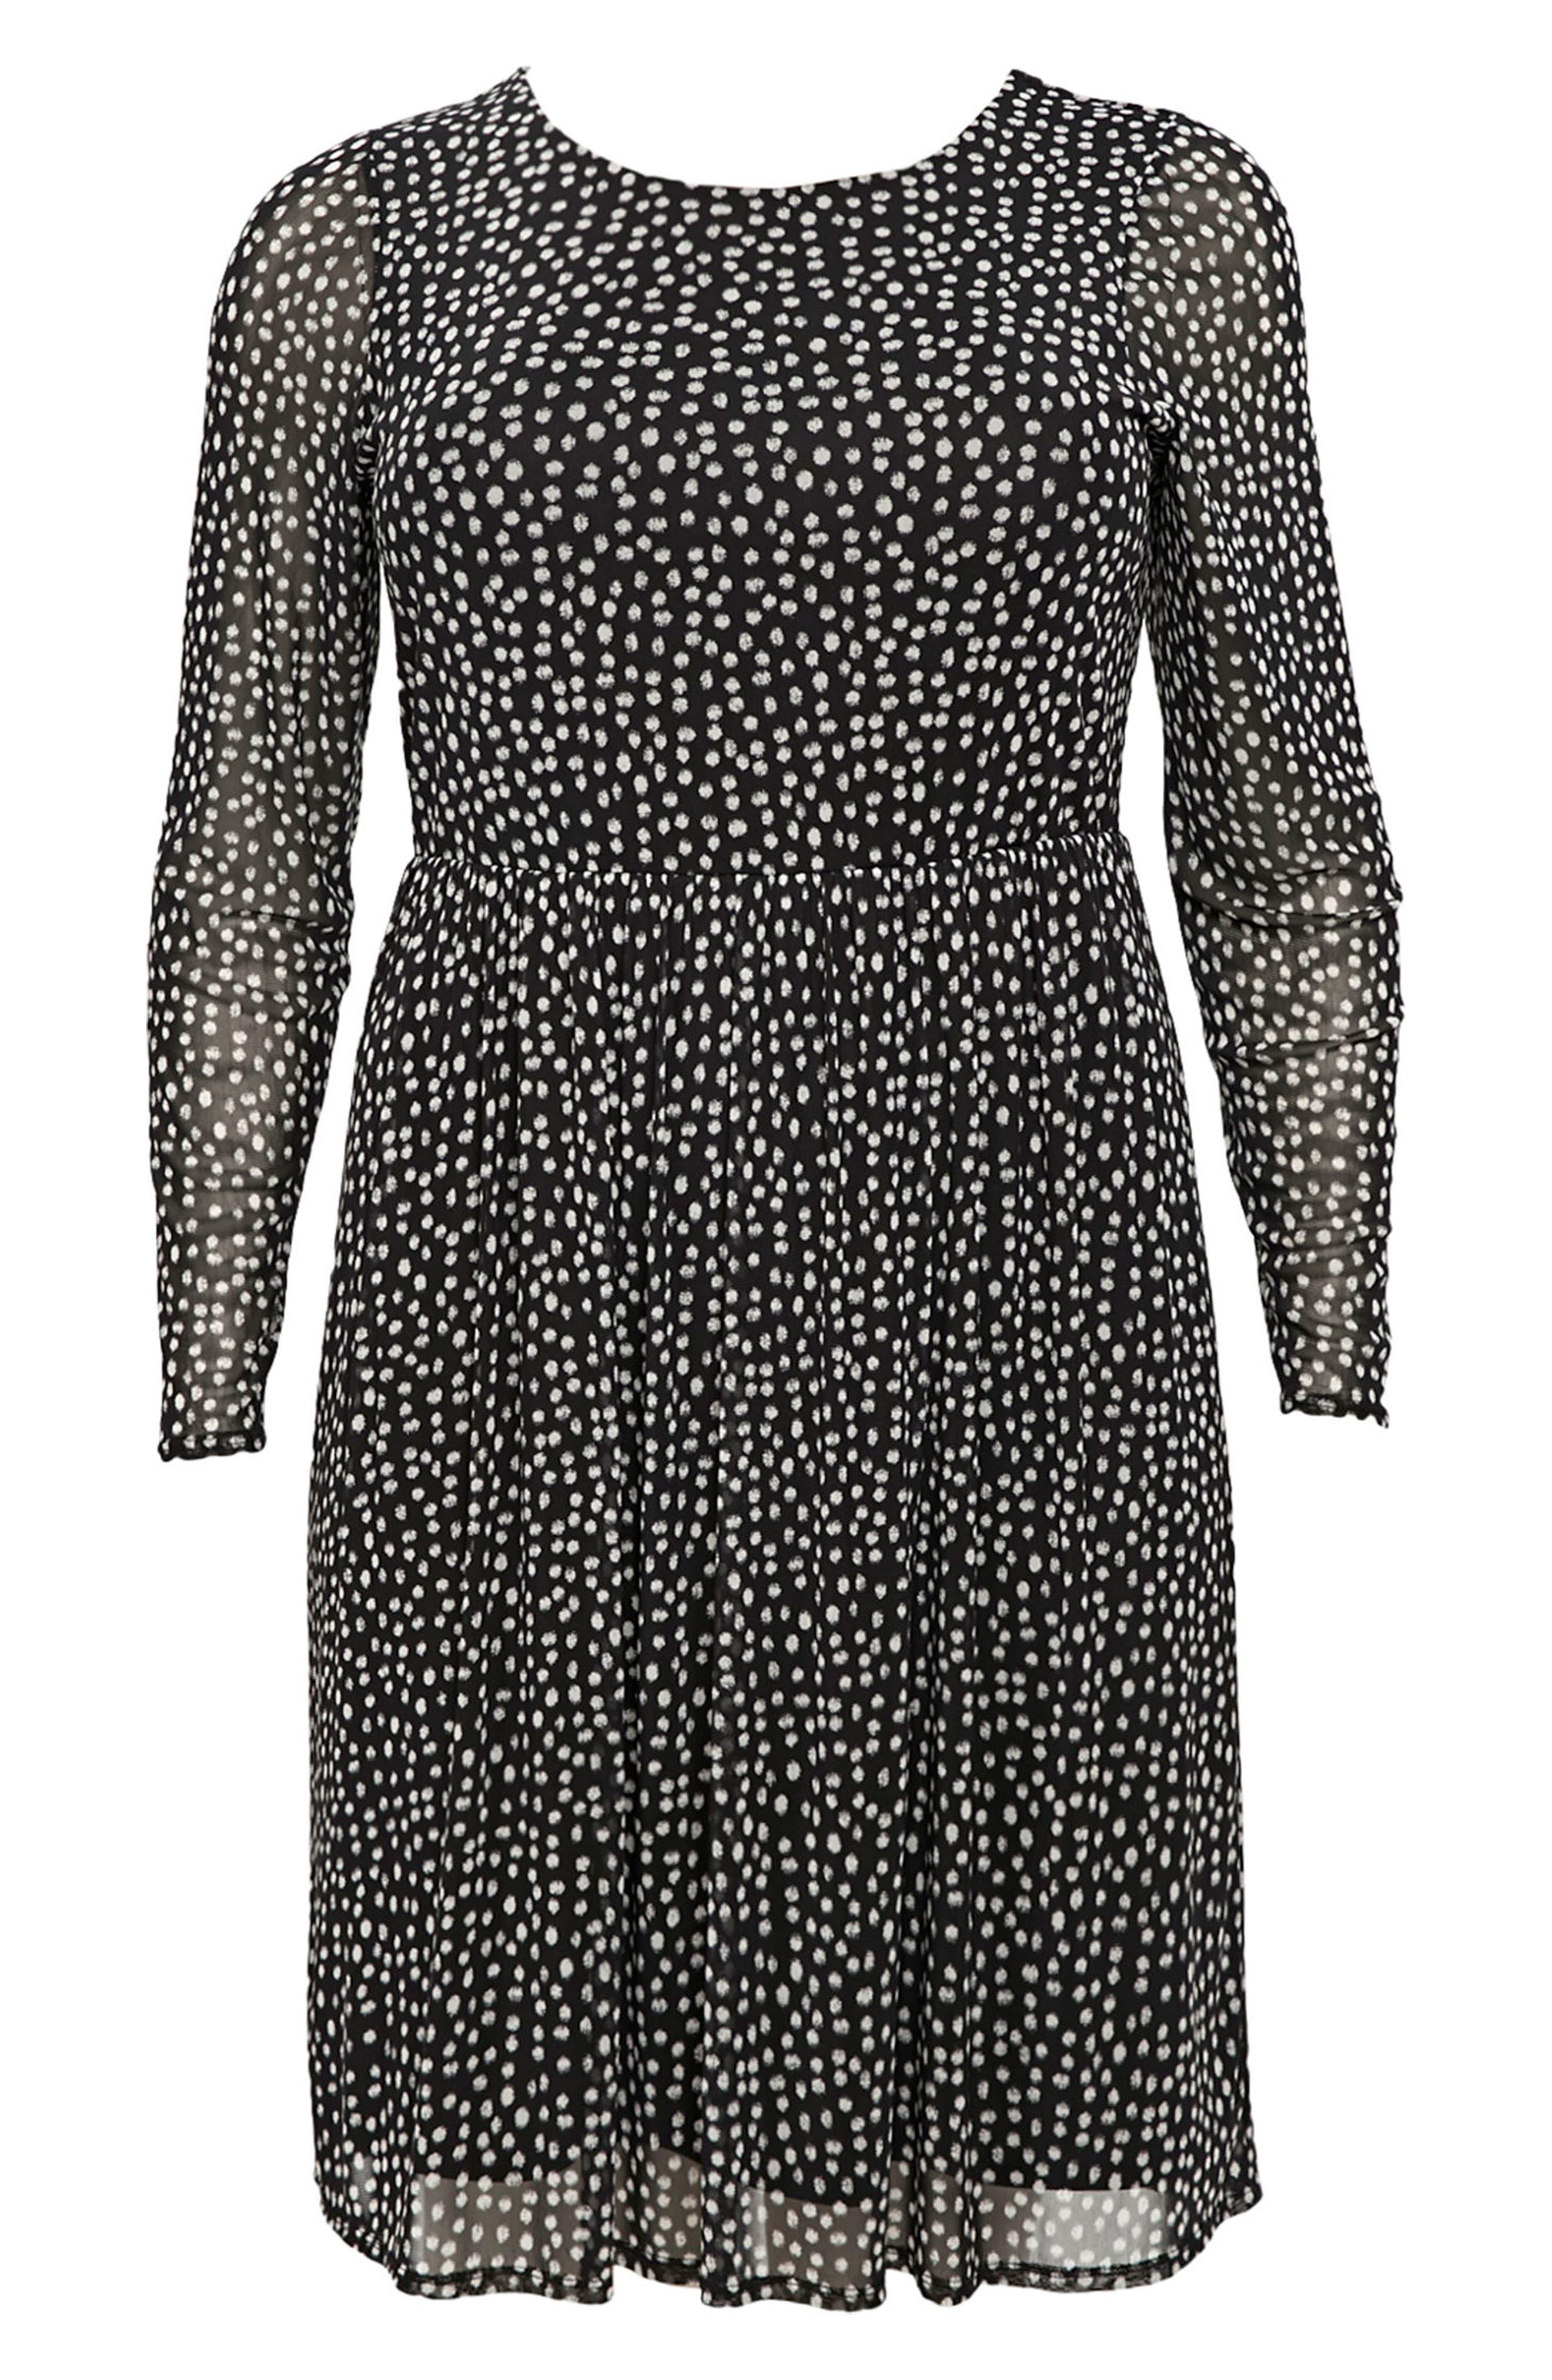 Smudge Print Fit & Flare Dress,                             Alternate thumbnail 4, color,                             010